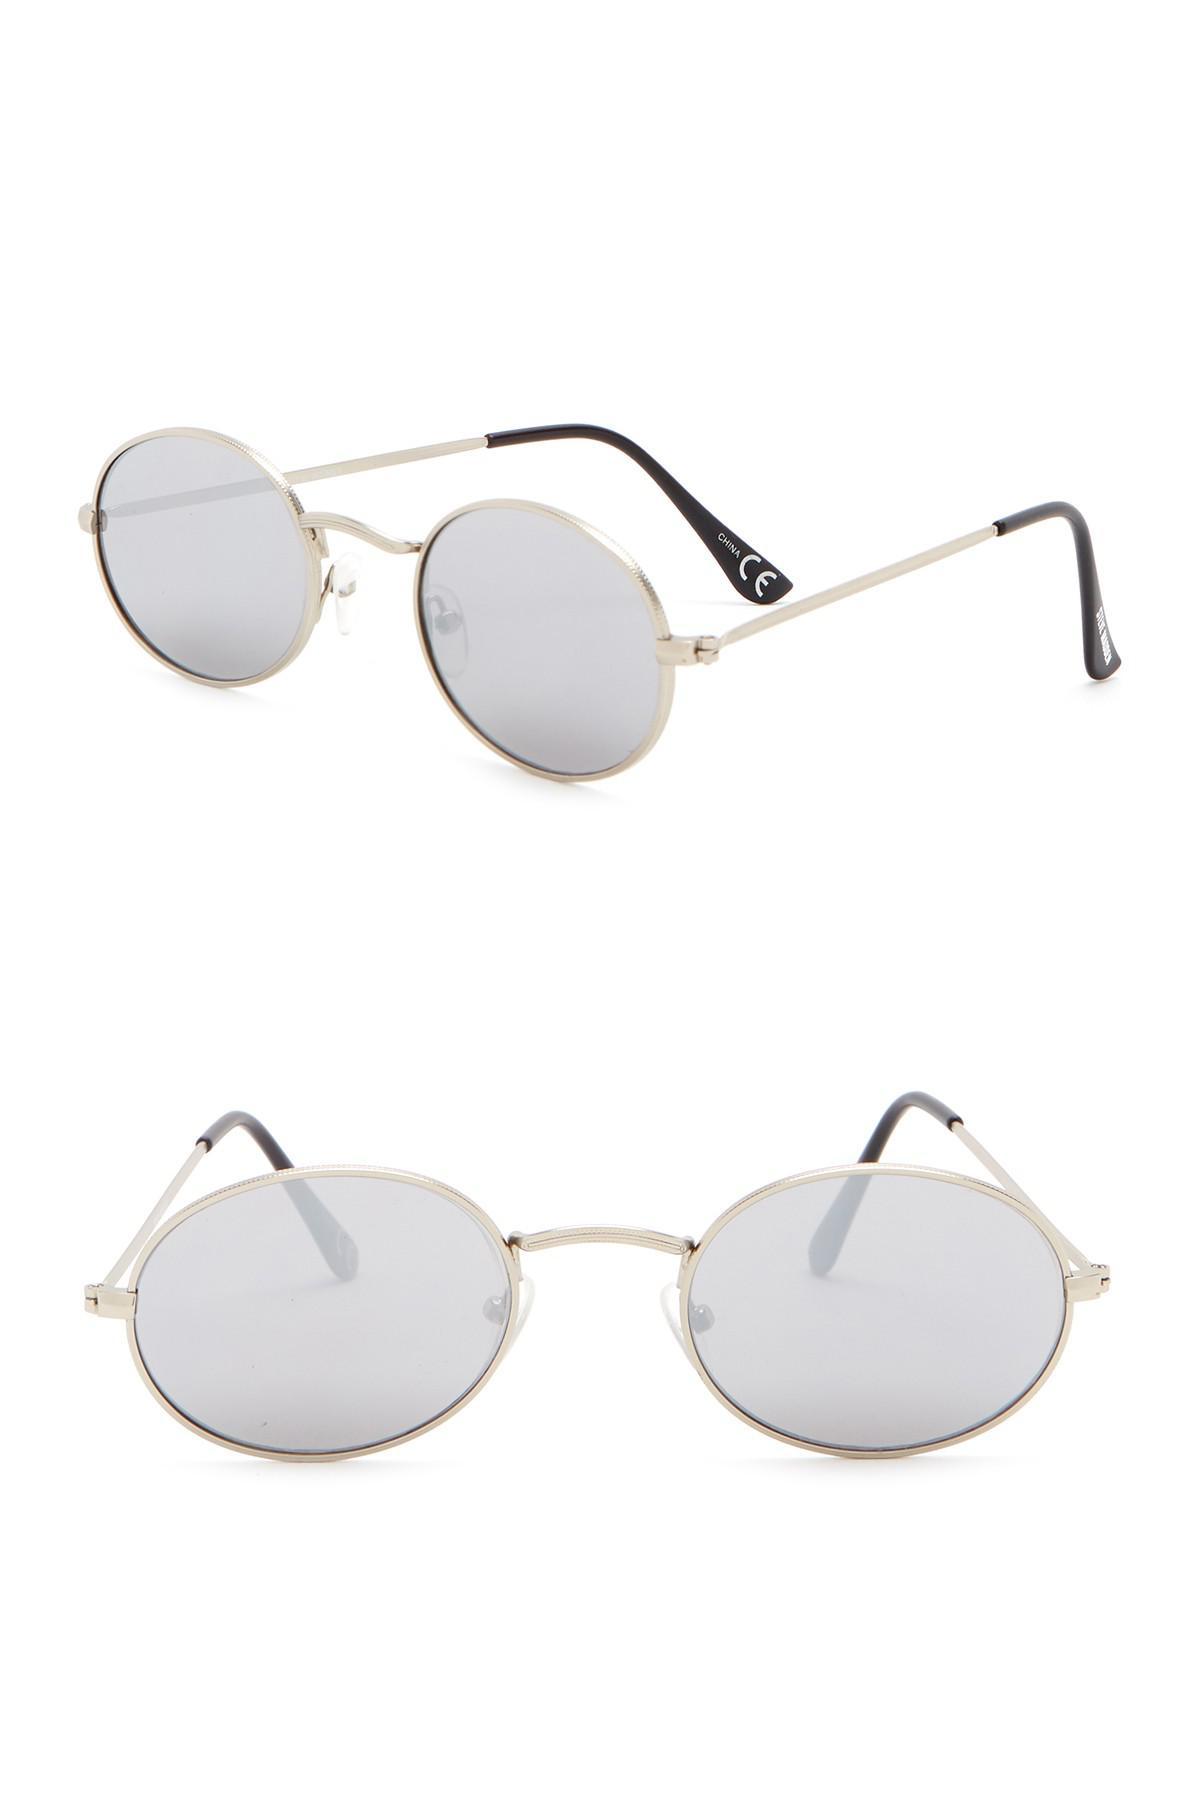 cbefe144953 Lyst - Steve Madden 50mm Flat Lens Round Sunglasses in Metallic